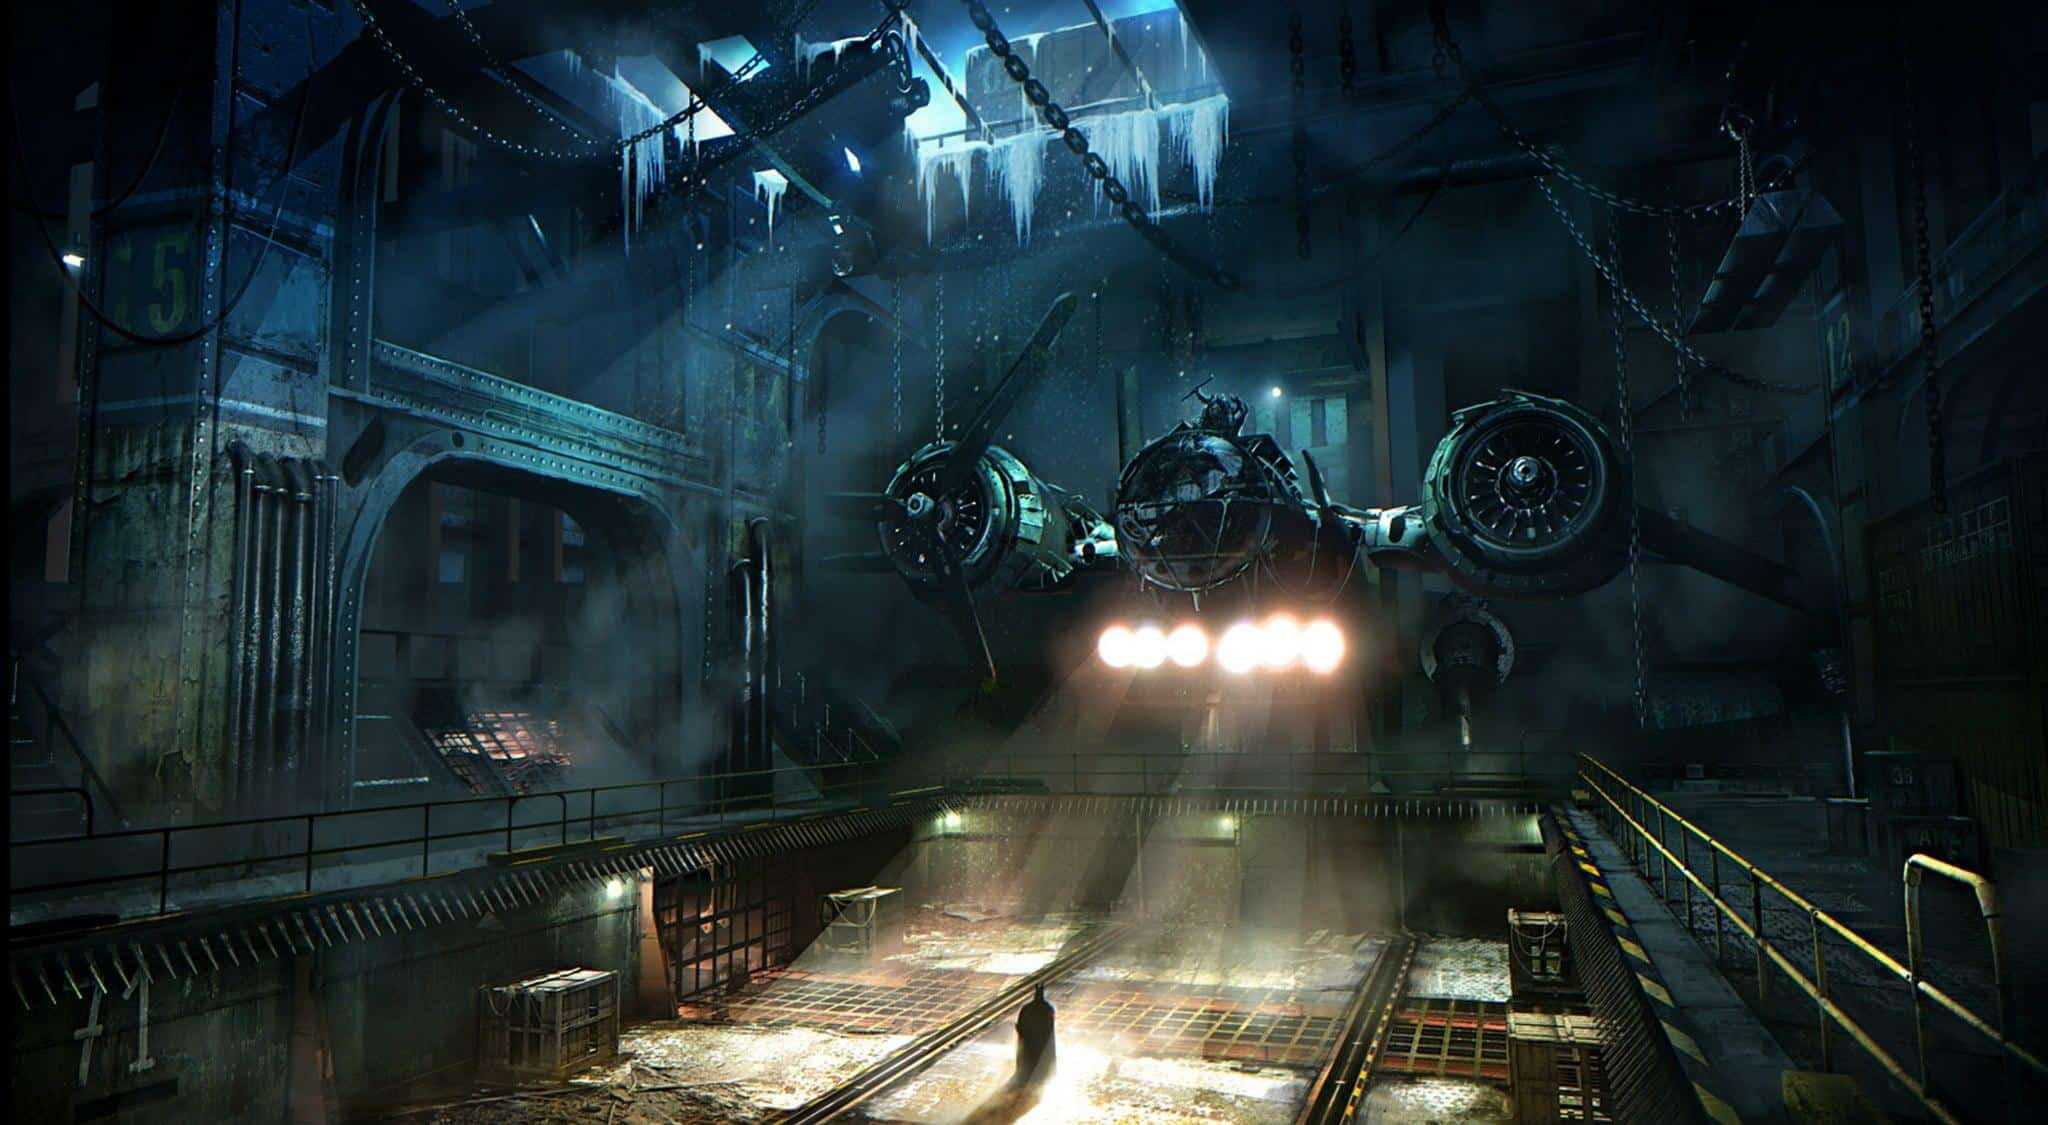 Batman Hangar